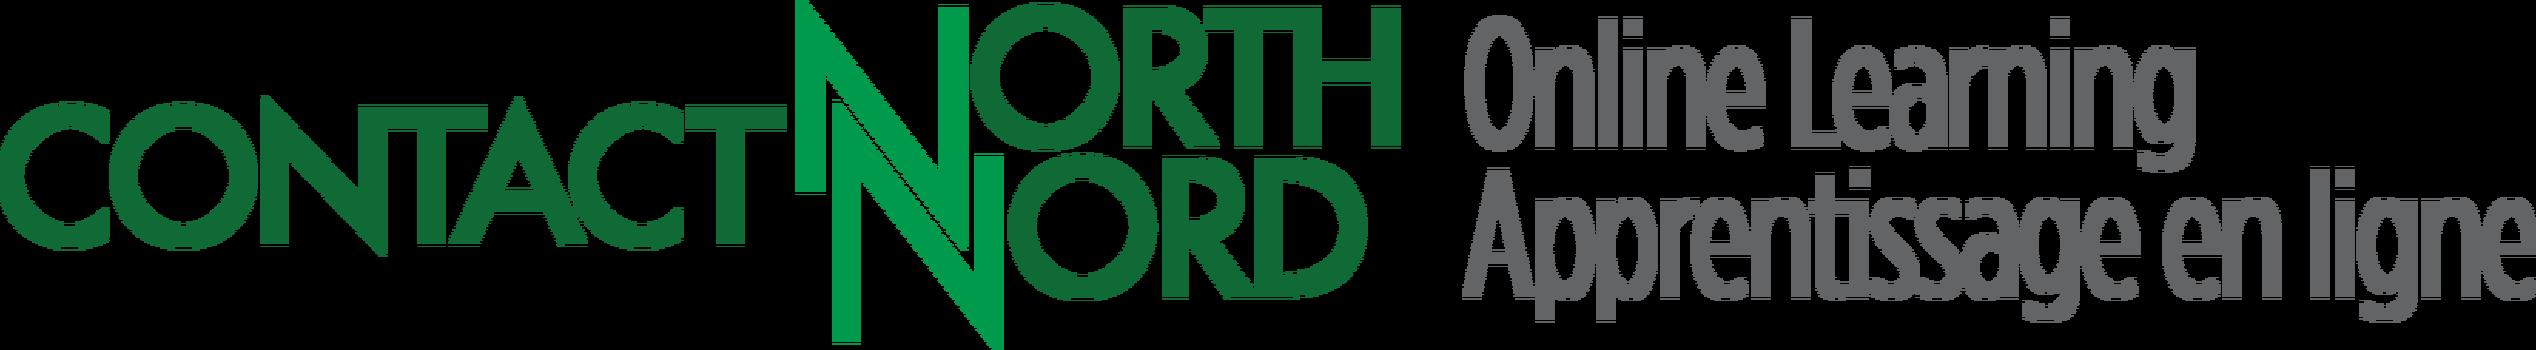 Contact North | Contact Nord logo